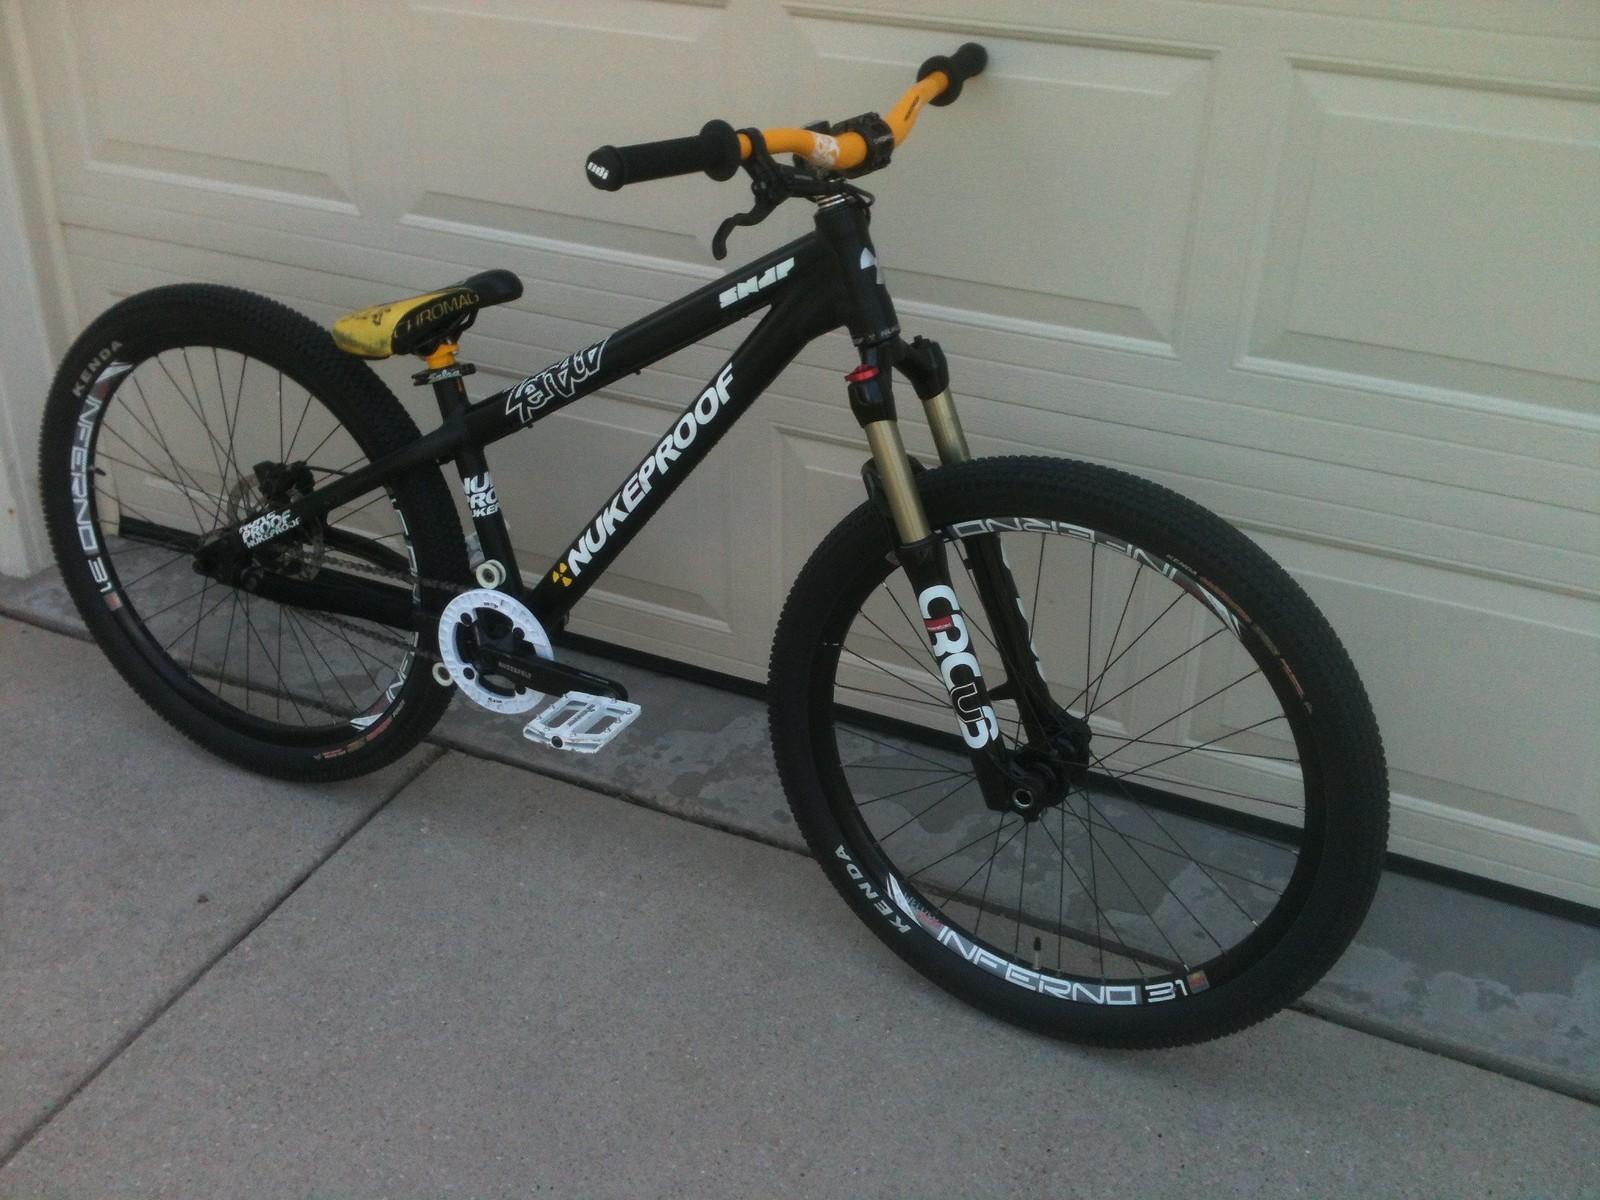 Doritos12145 Bike Check